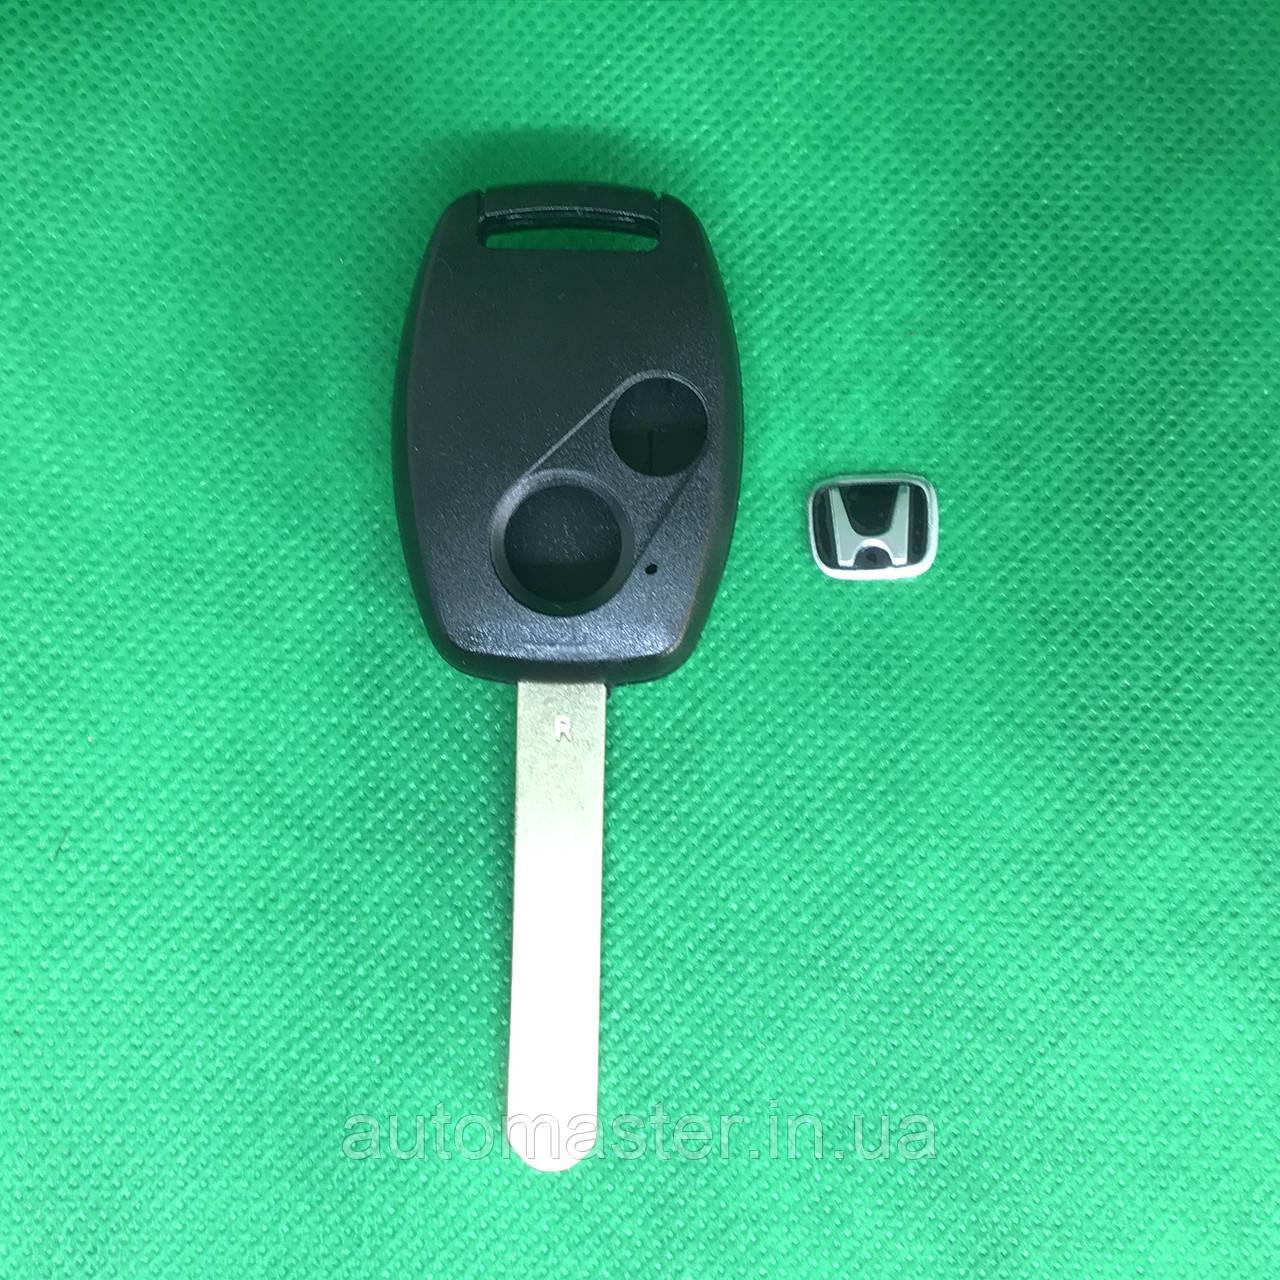 Корпус авто ключа Honda  Civic,CRV, Jazz, HRV  (Хонда) - 2 кнопки